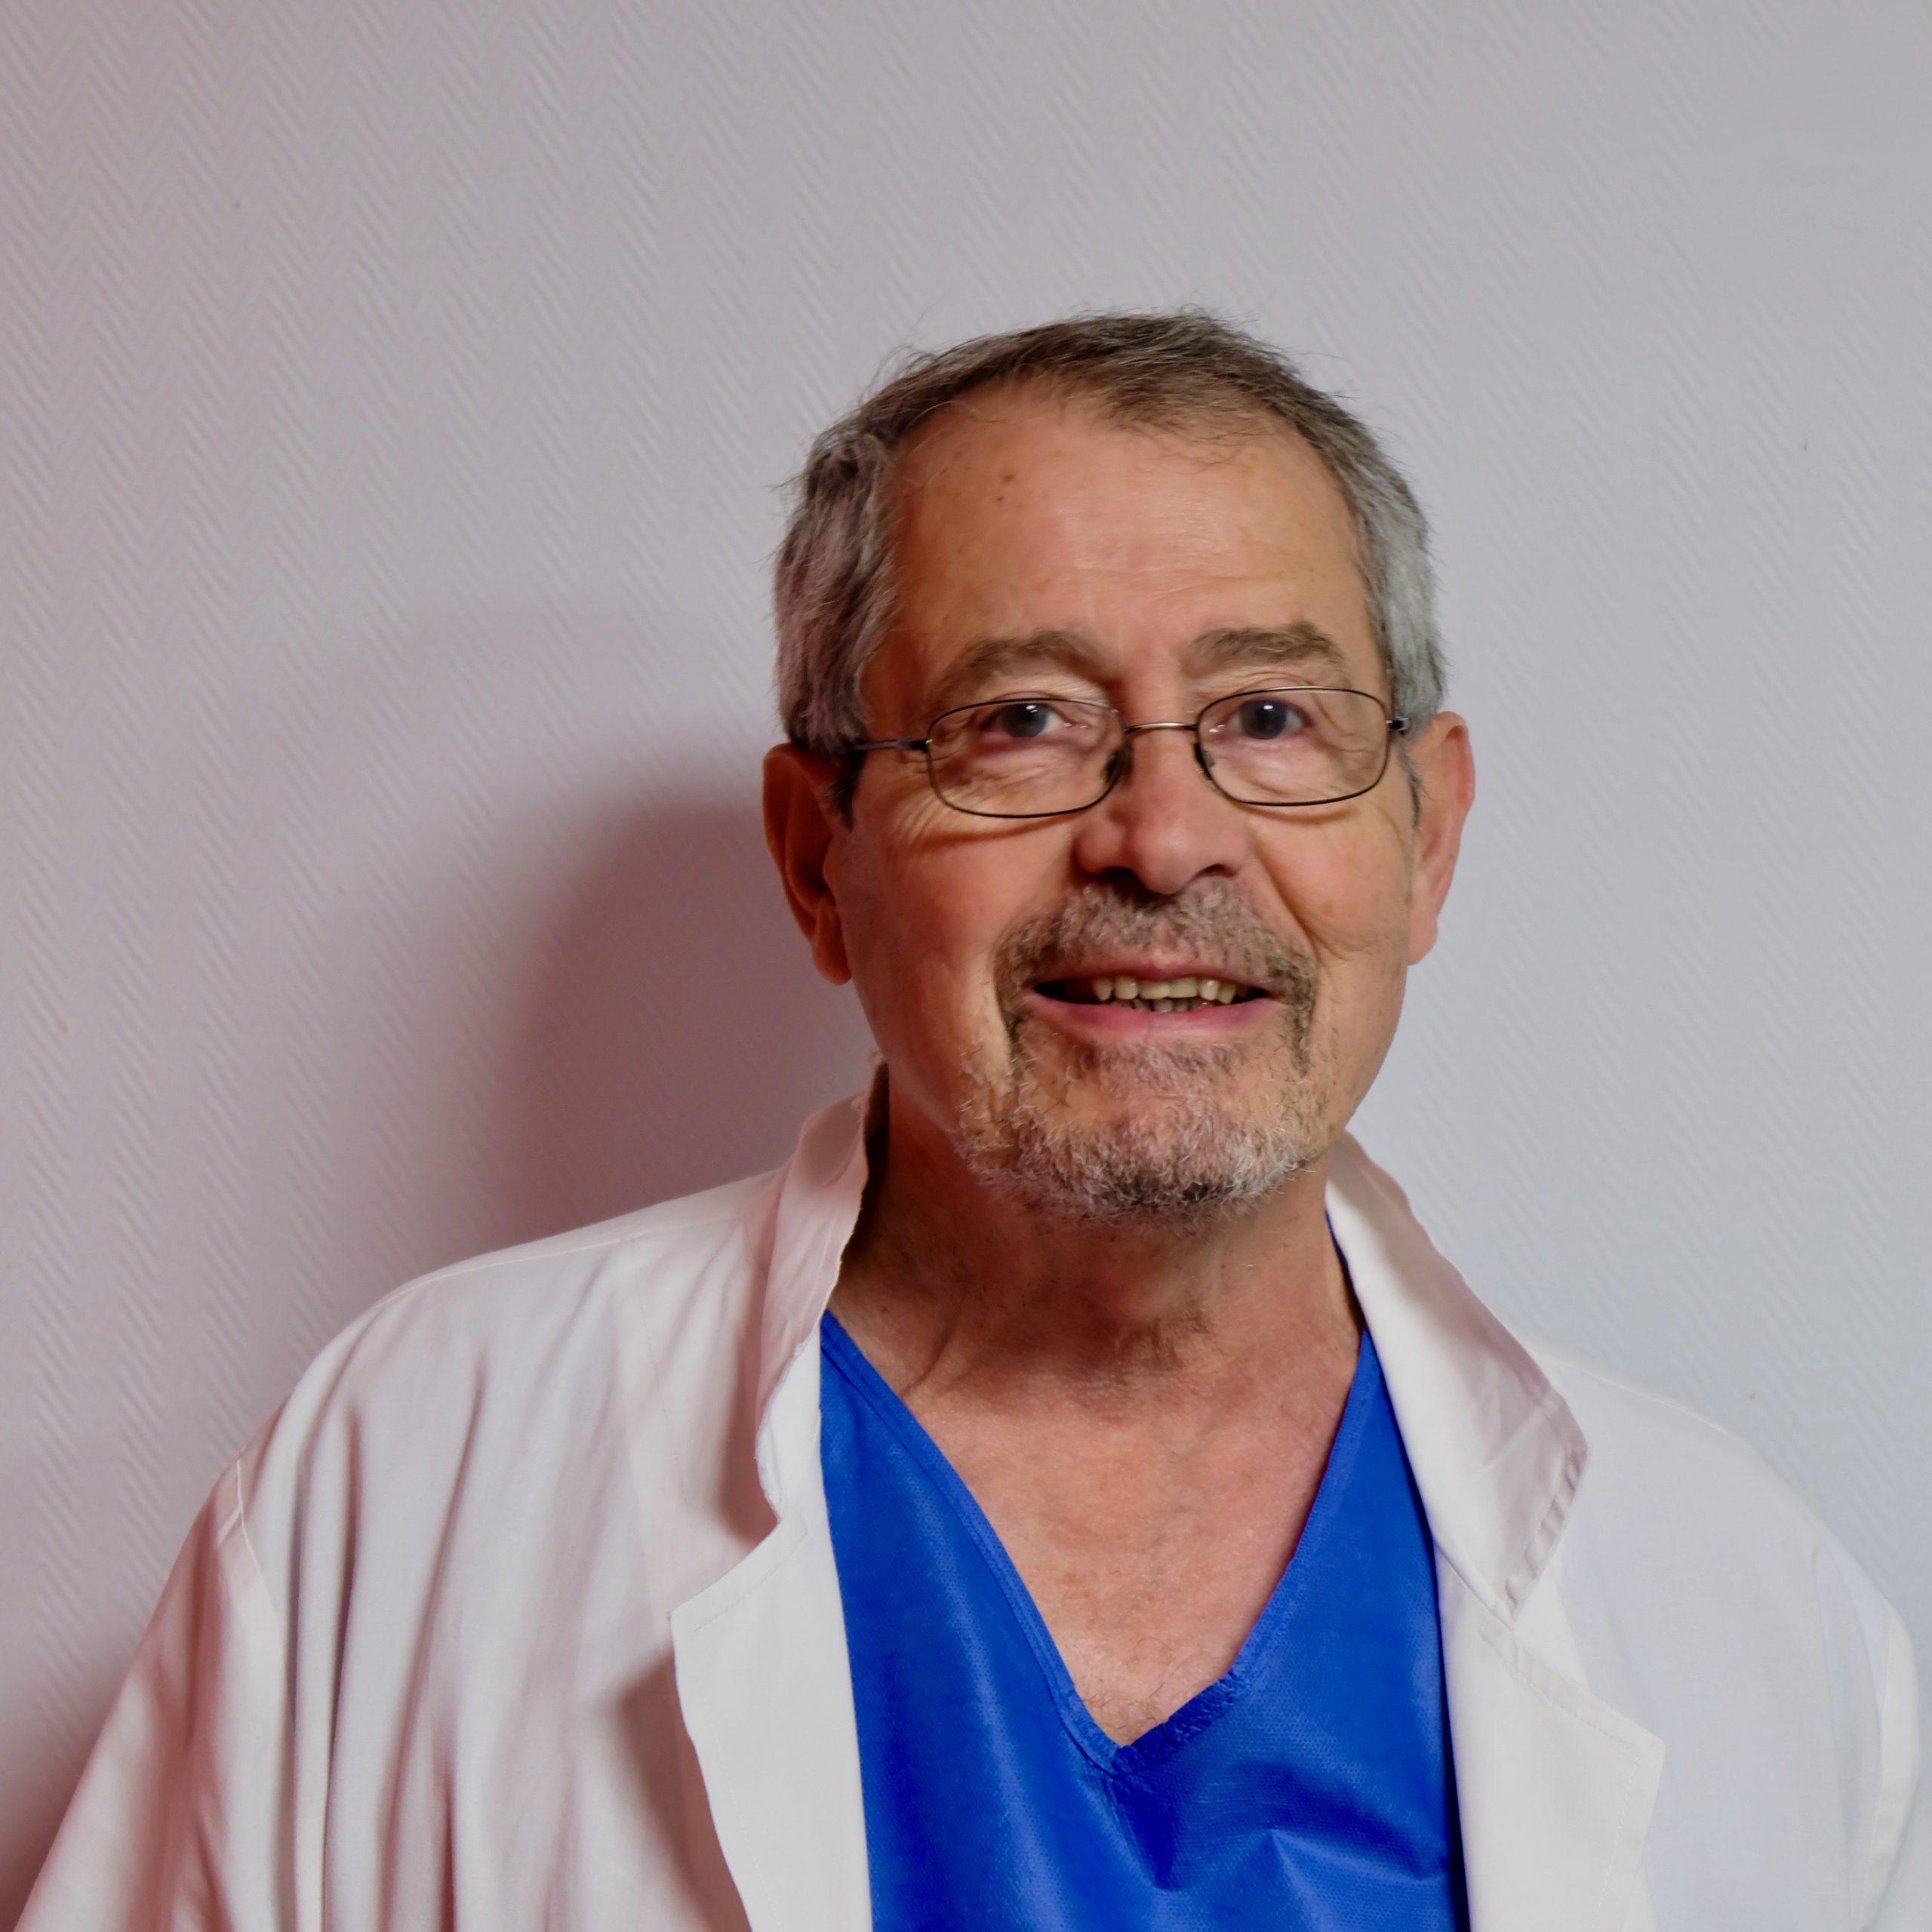 Dr KERBRAT